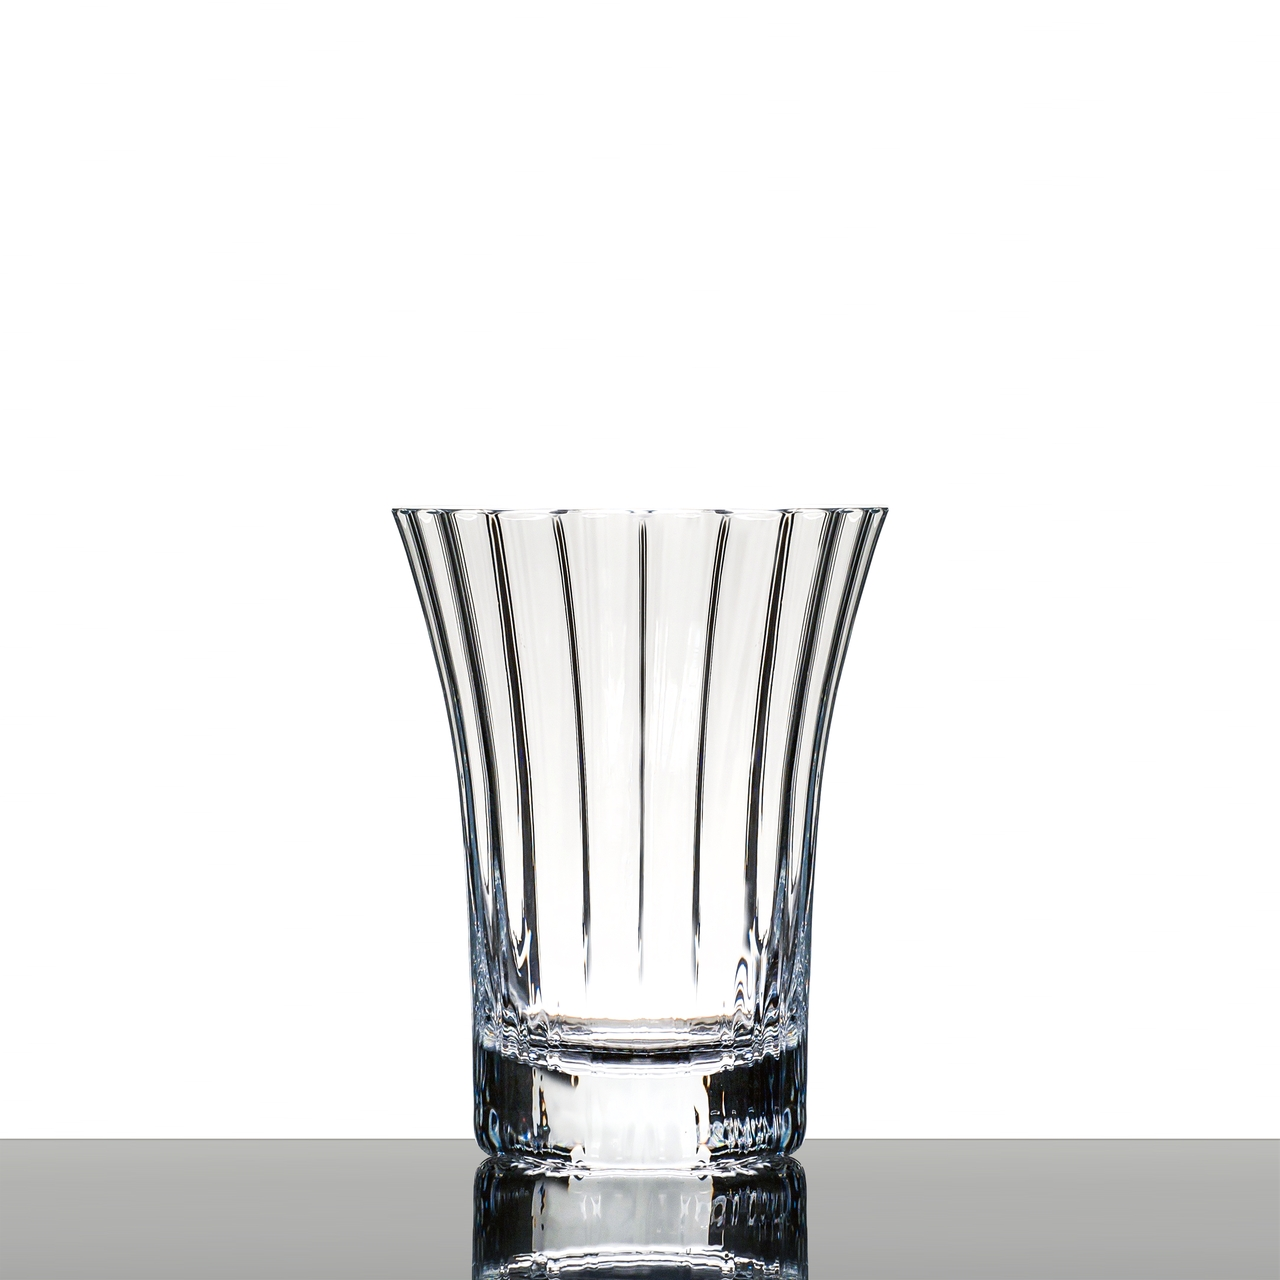 aurelia trinkgl ser von lsa glasklar berlin. Black Bedroom Furniture Sets. Home Design Ideas